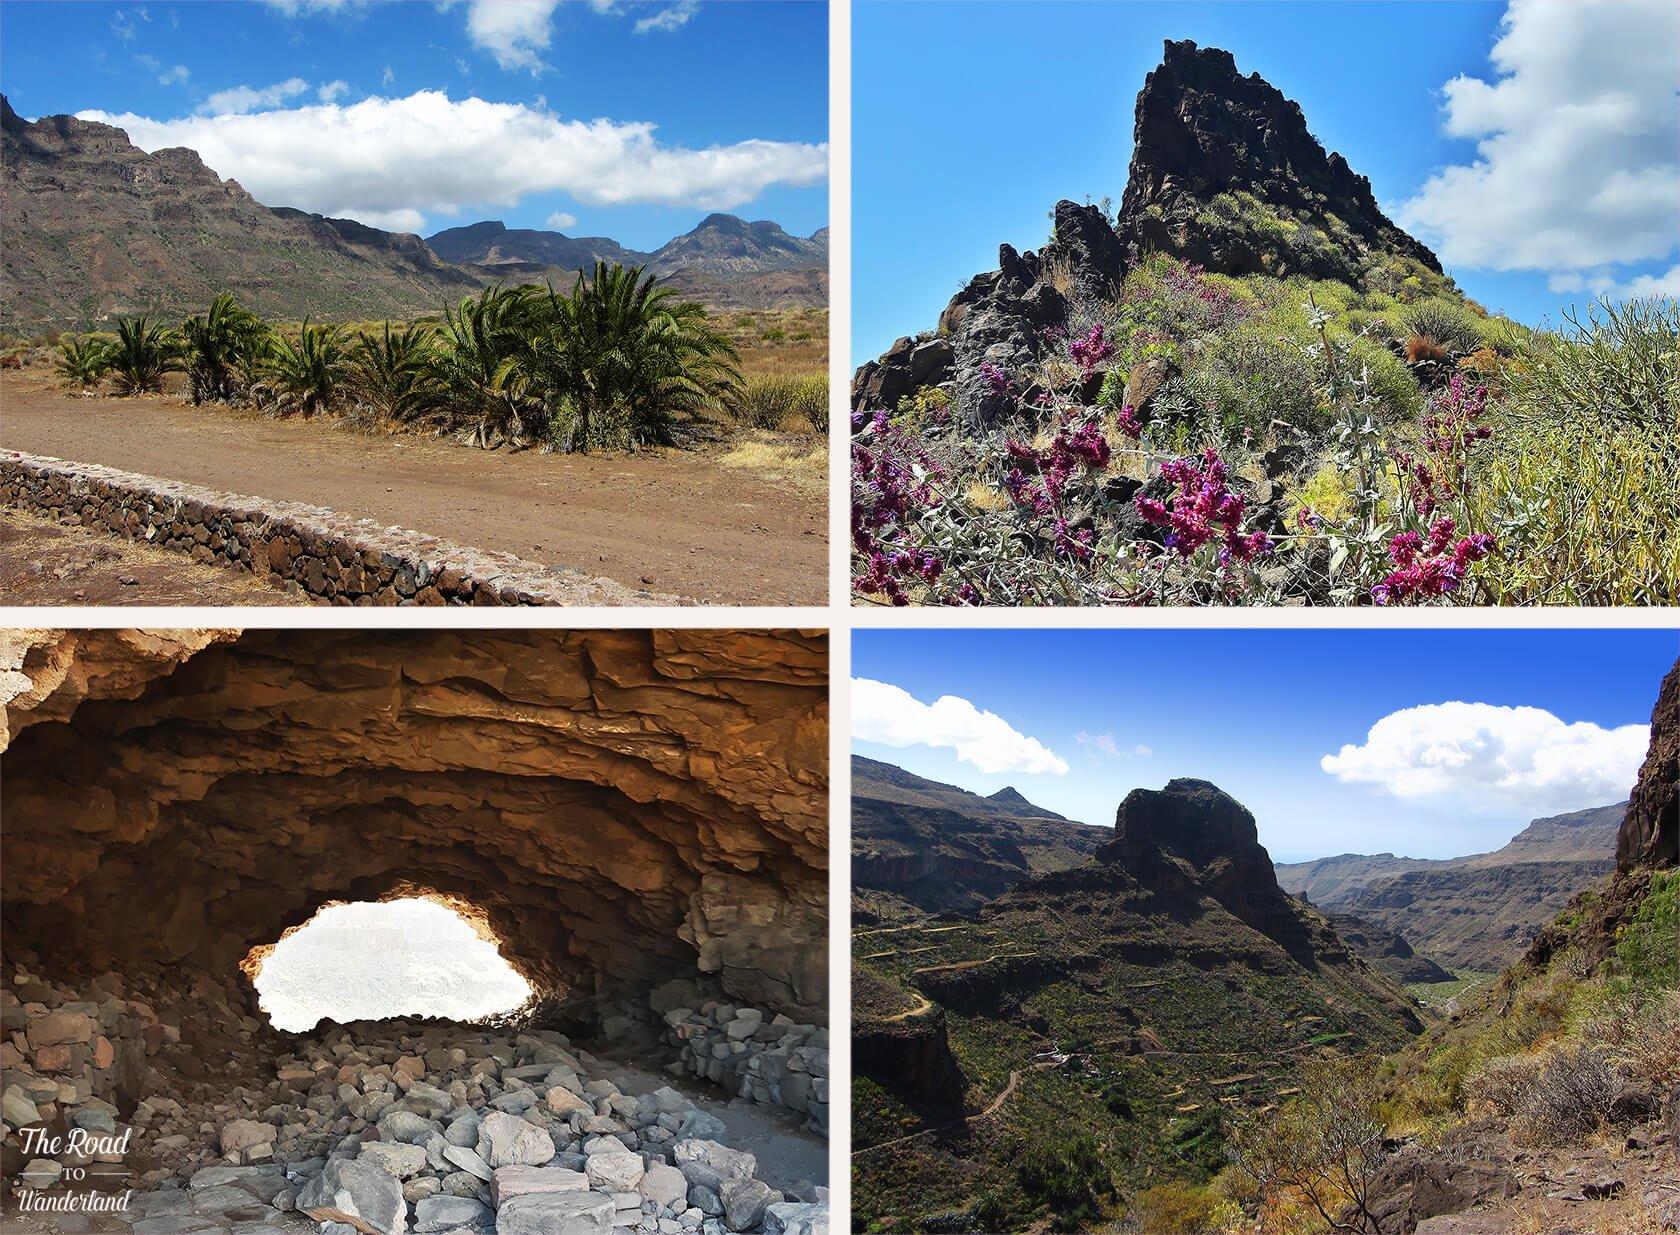 Landscapes of Gran Canaria: La Fortaleza